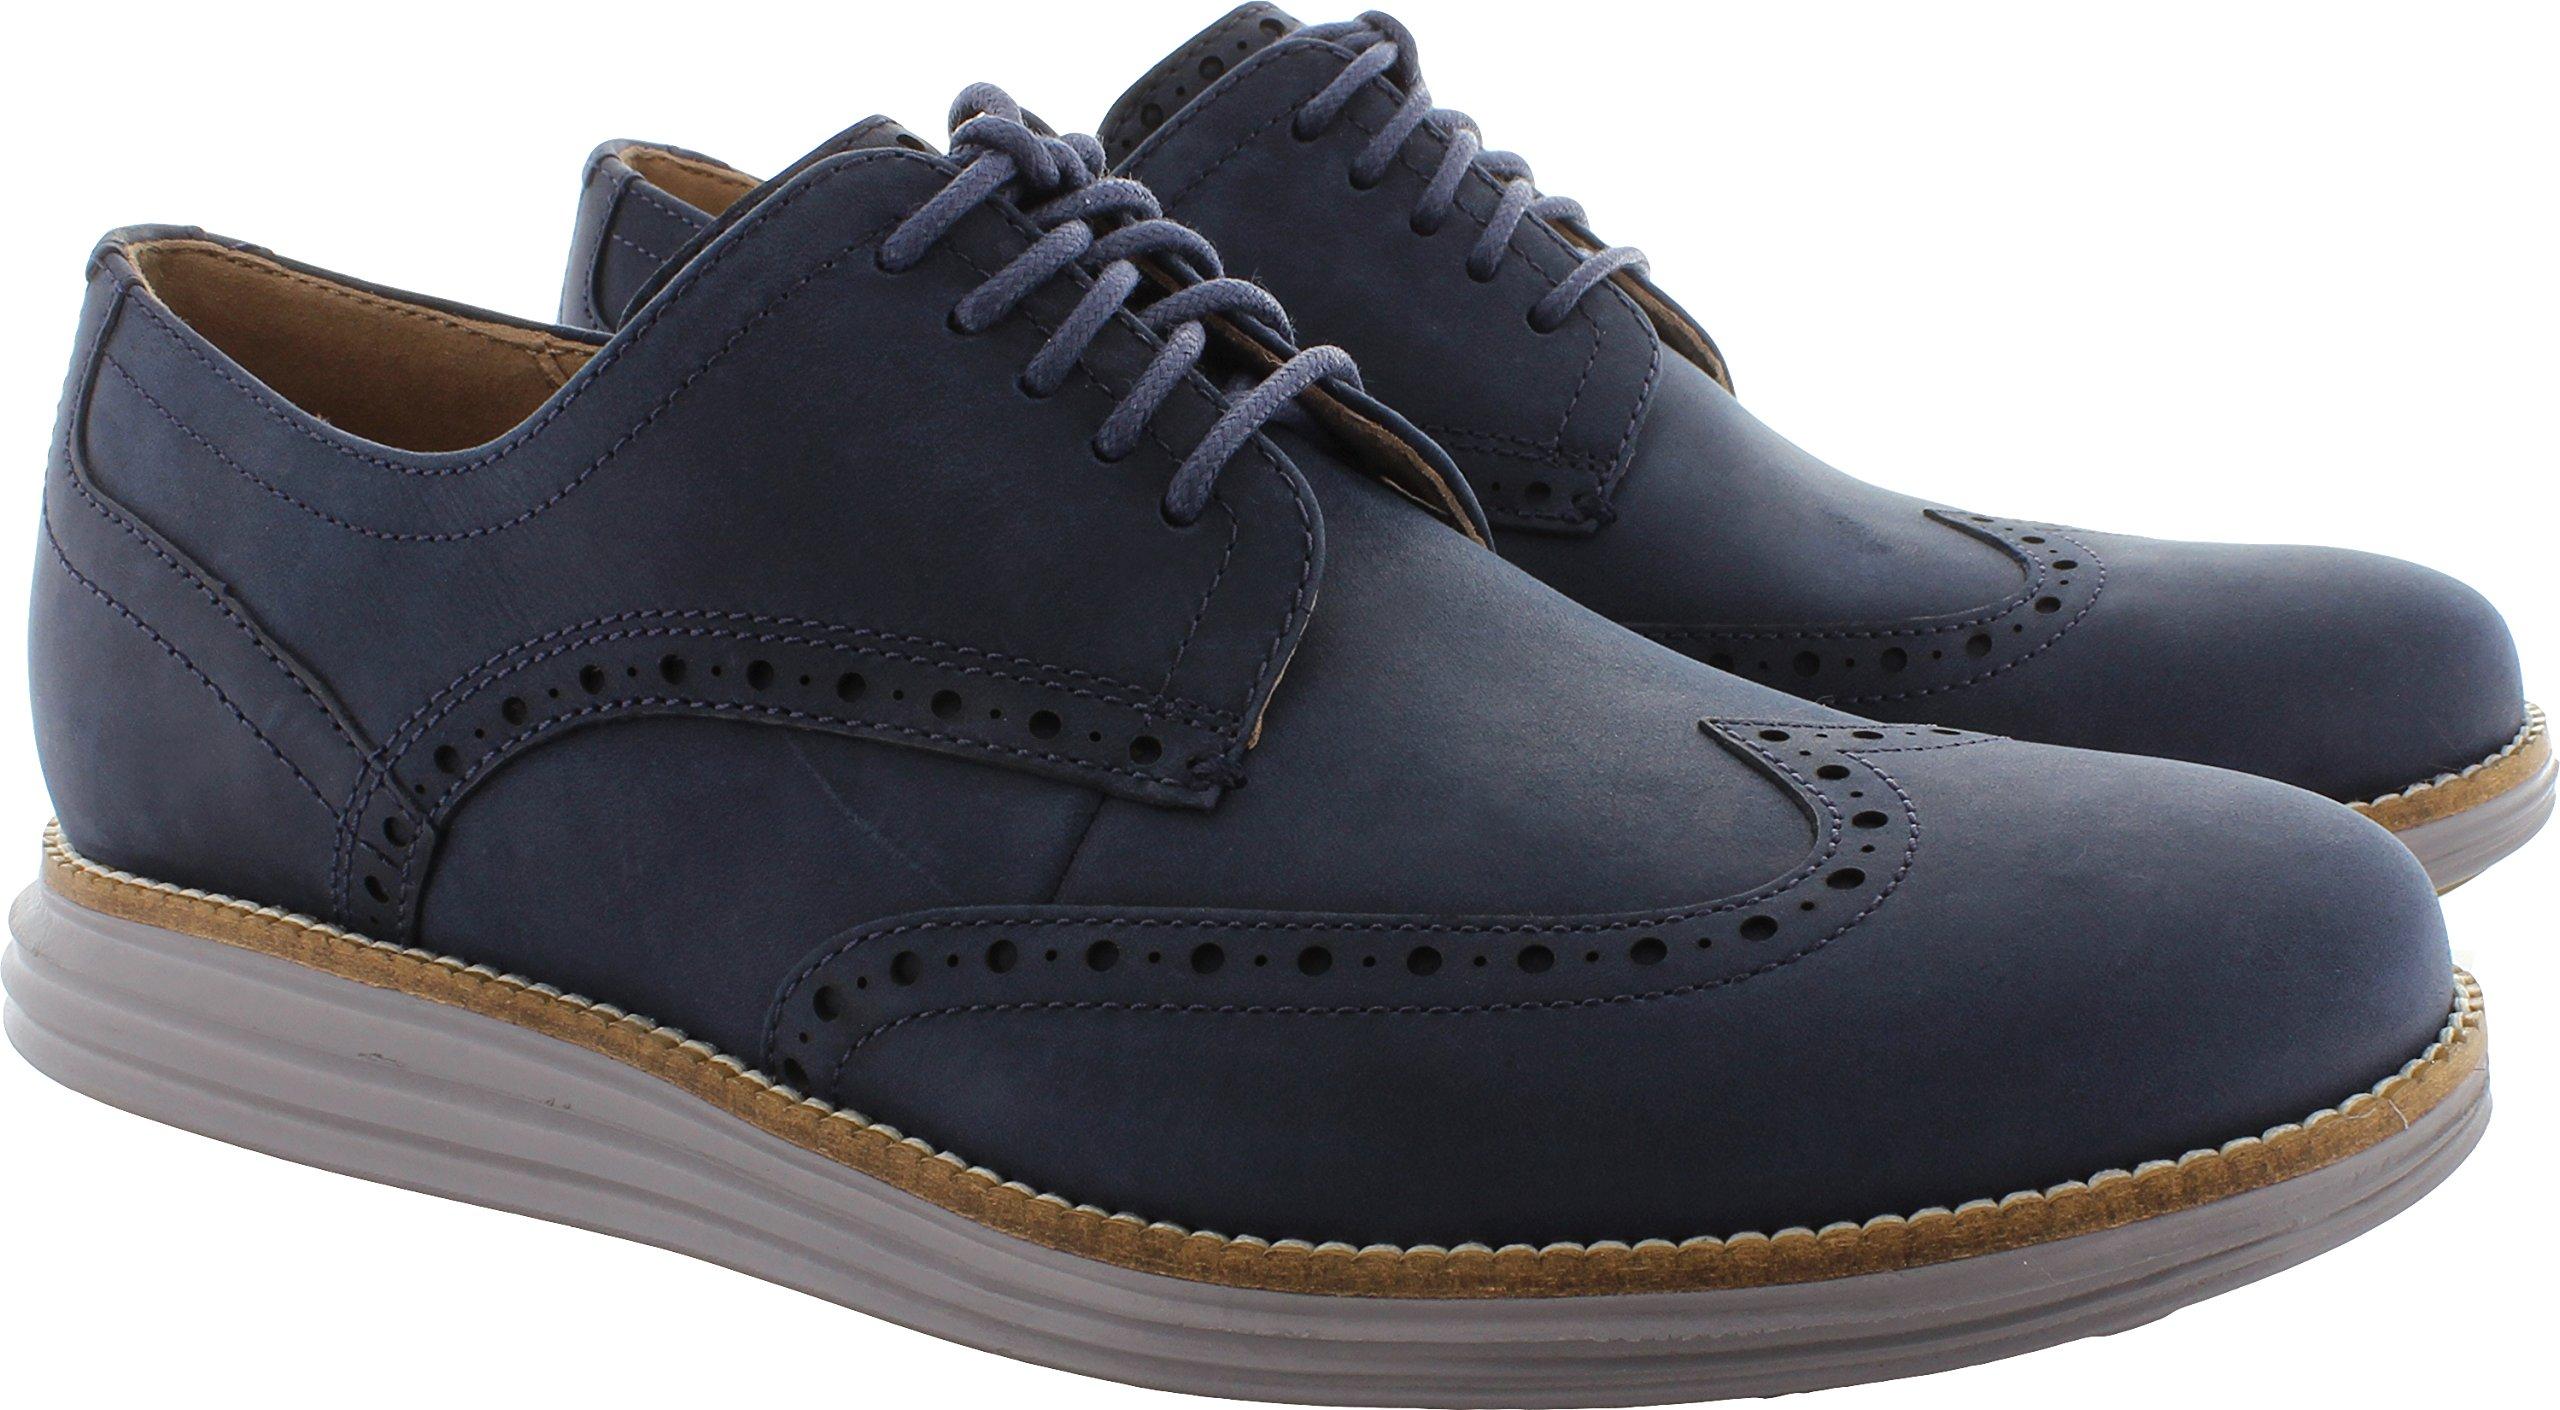 Cole Haan Men's Original Grand Shortwing Oxford, Blazer Blue/Ironstone, 11 Medium US